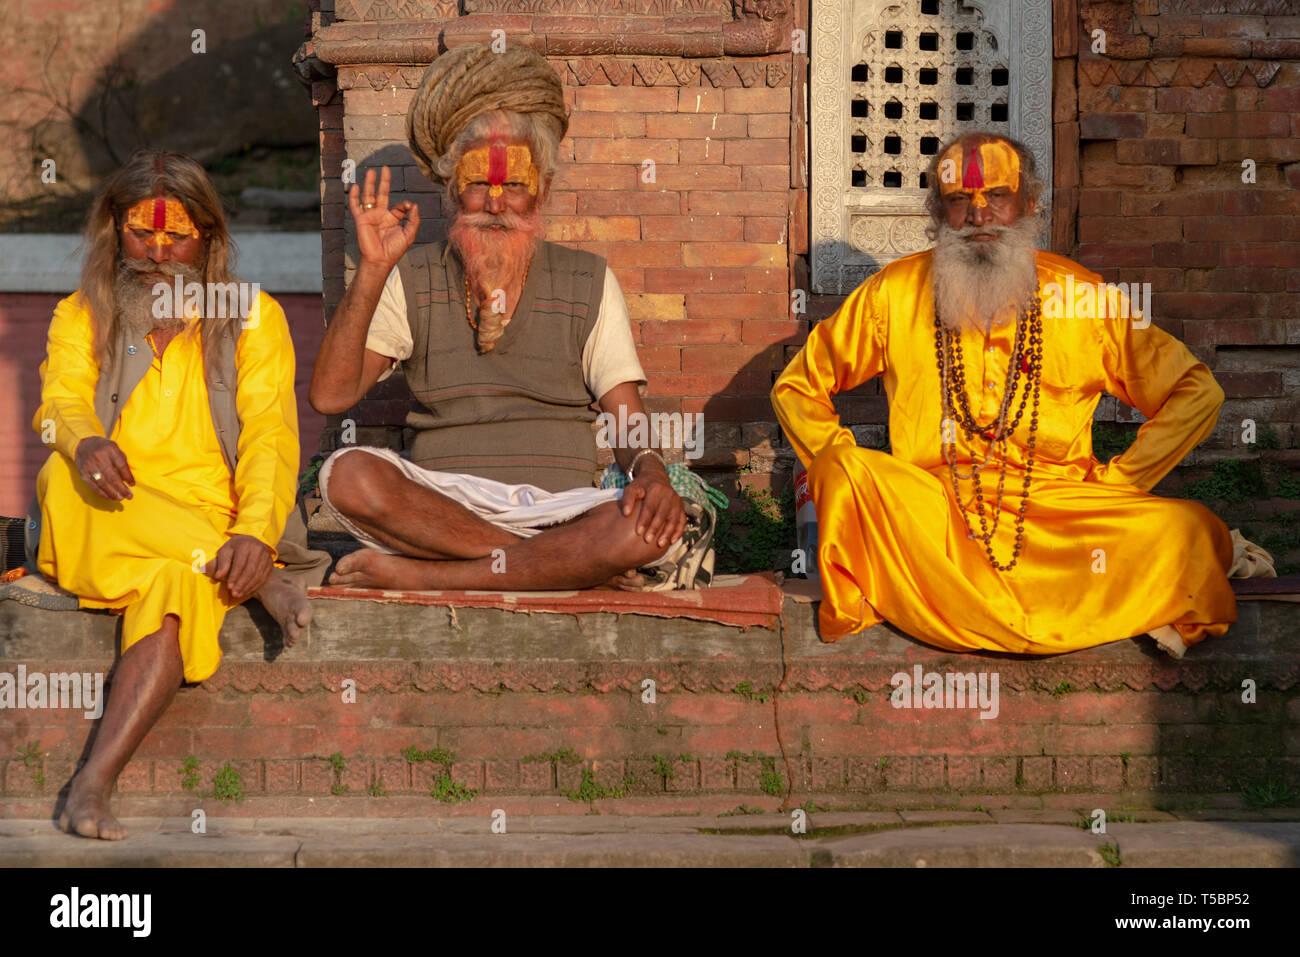 TILGANGA, KATHMANDU, NEPAL - APRIL 2, 2019: a group of 3 Sadhus posing for the camera - Stock Image